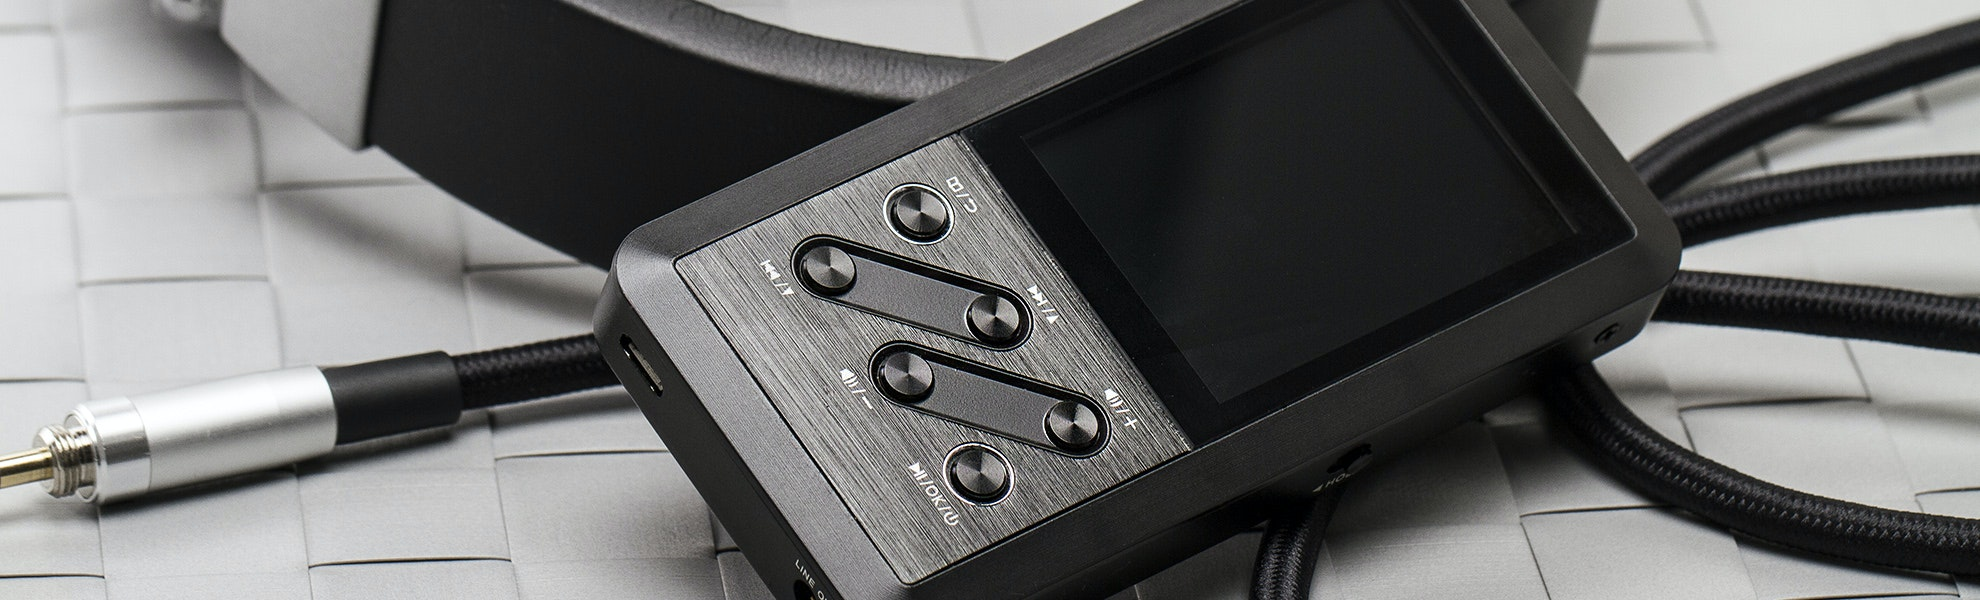 Fiio X3 Audiophile Music Player